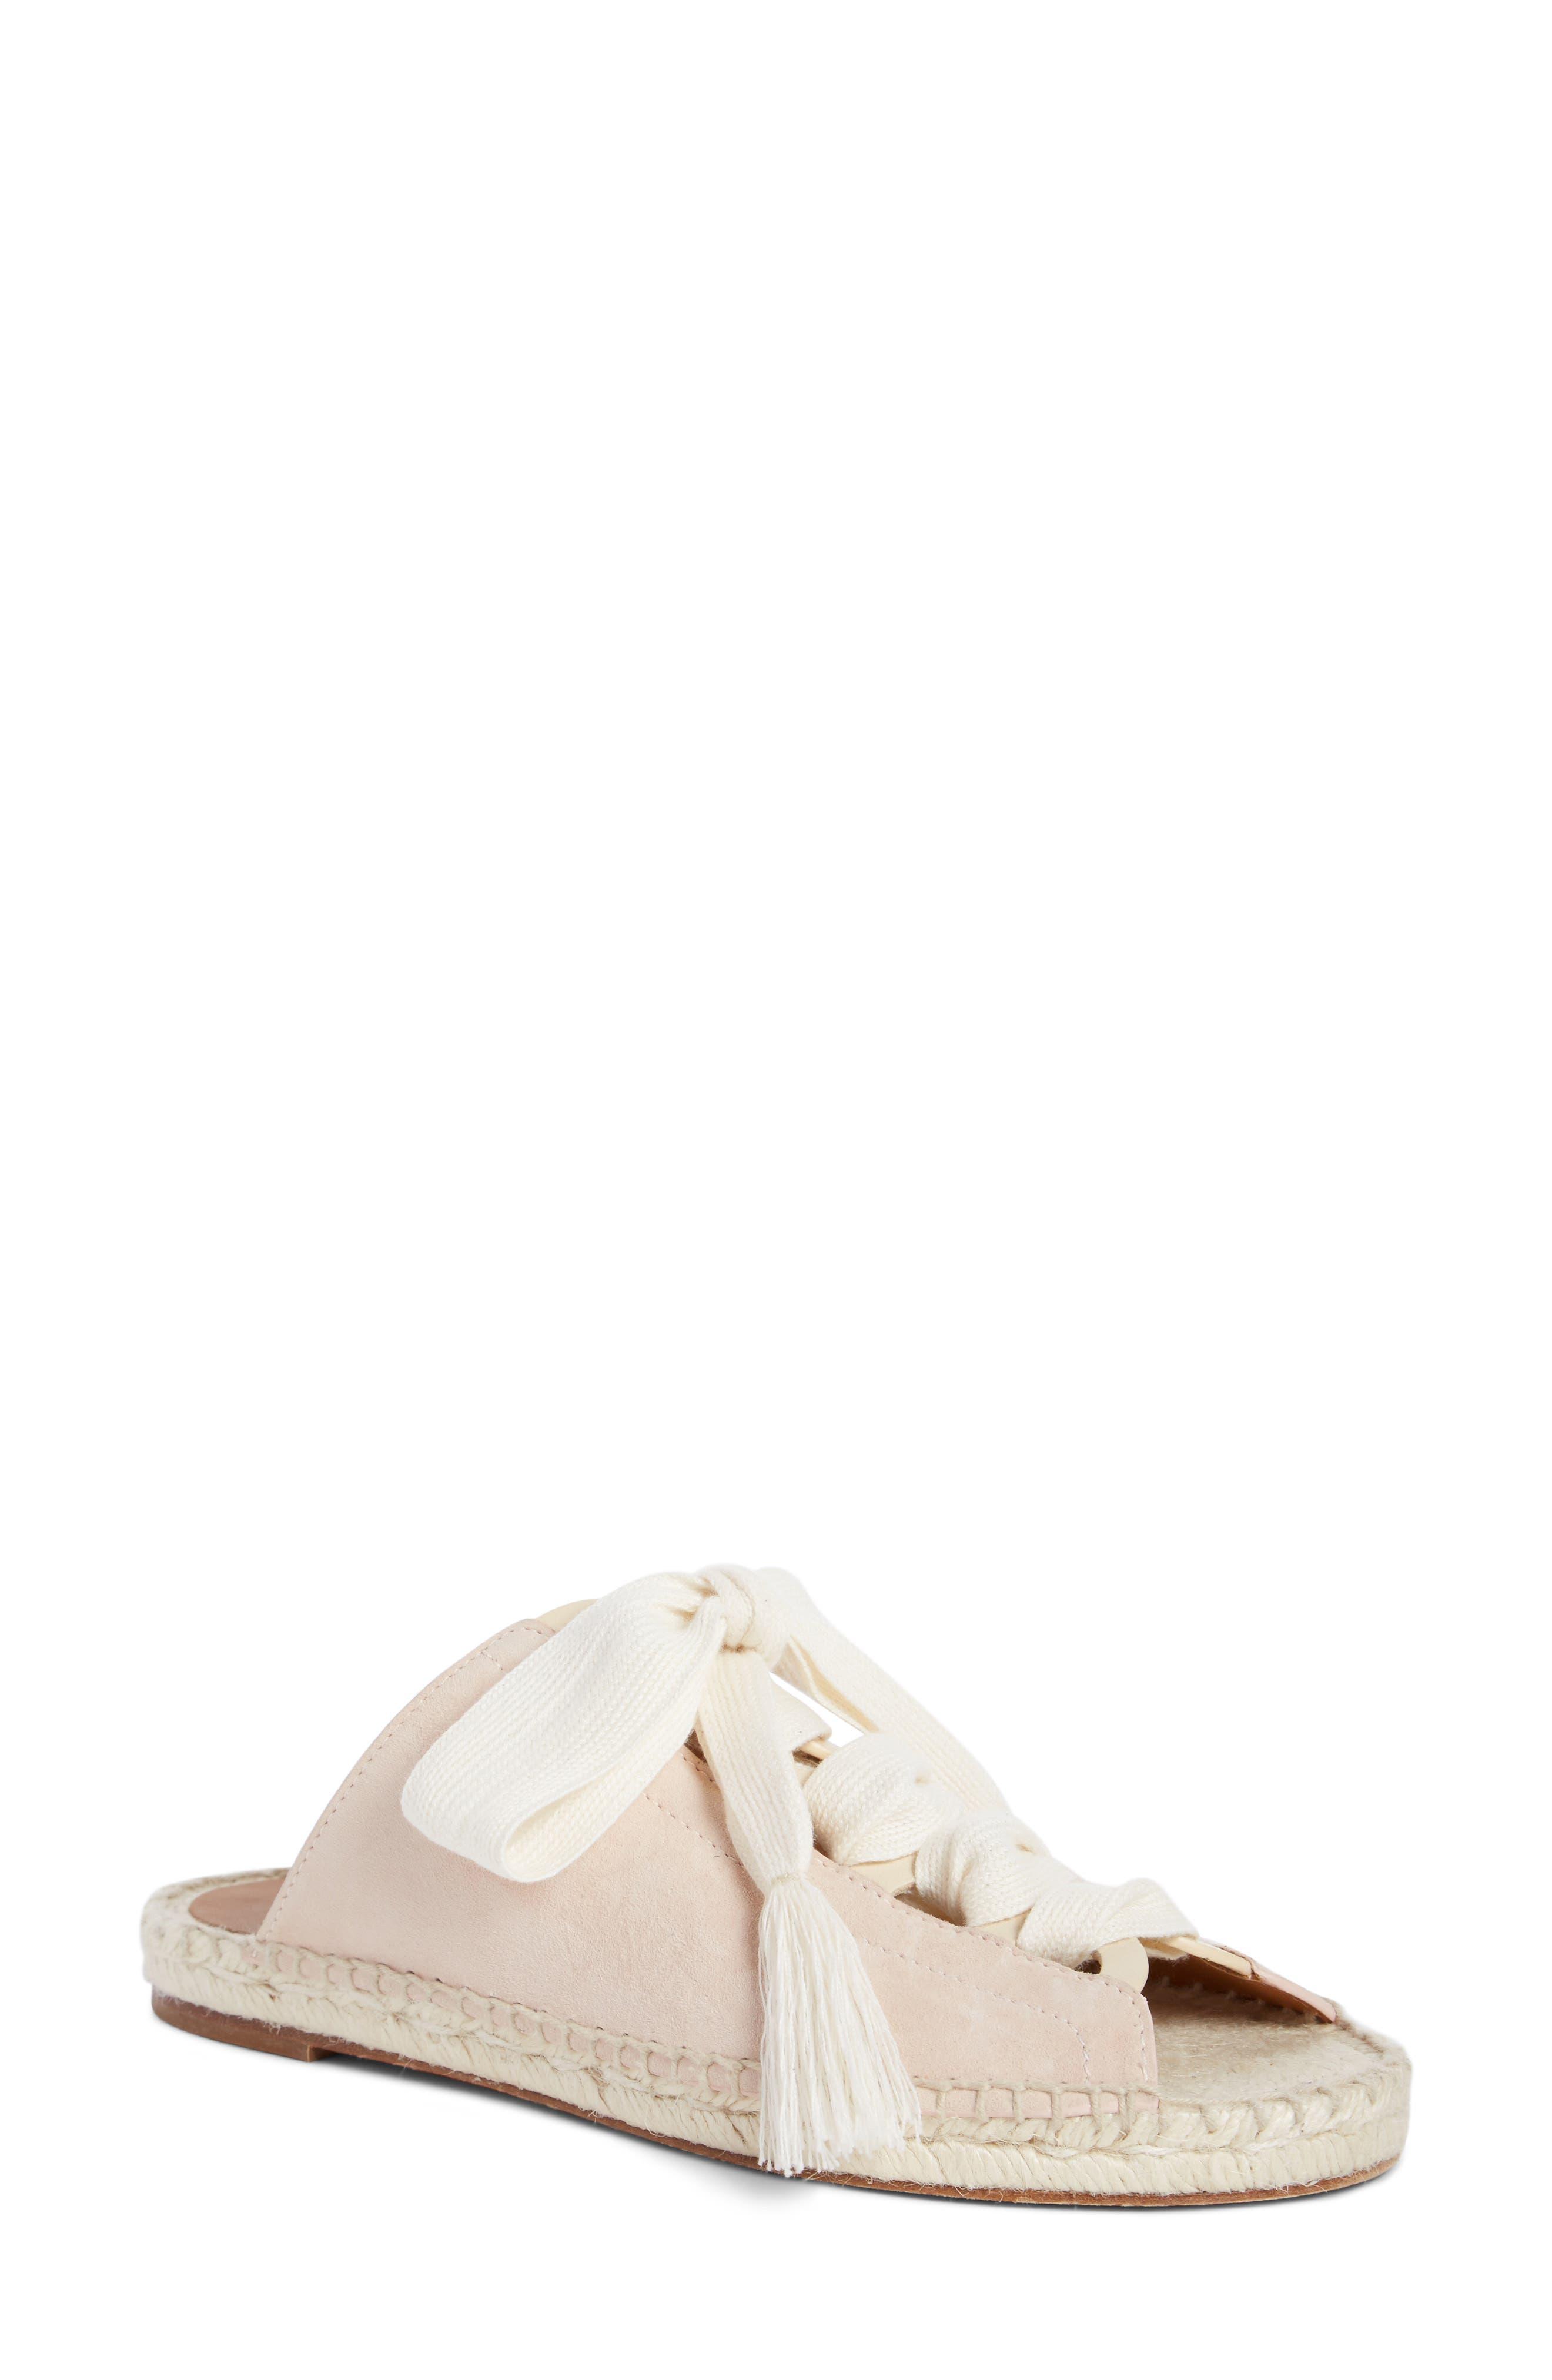 Harper Lace-Up Espadrille Slide Sandal,                             Main thumbnail 1, color,                             Maple Pink